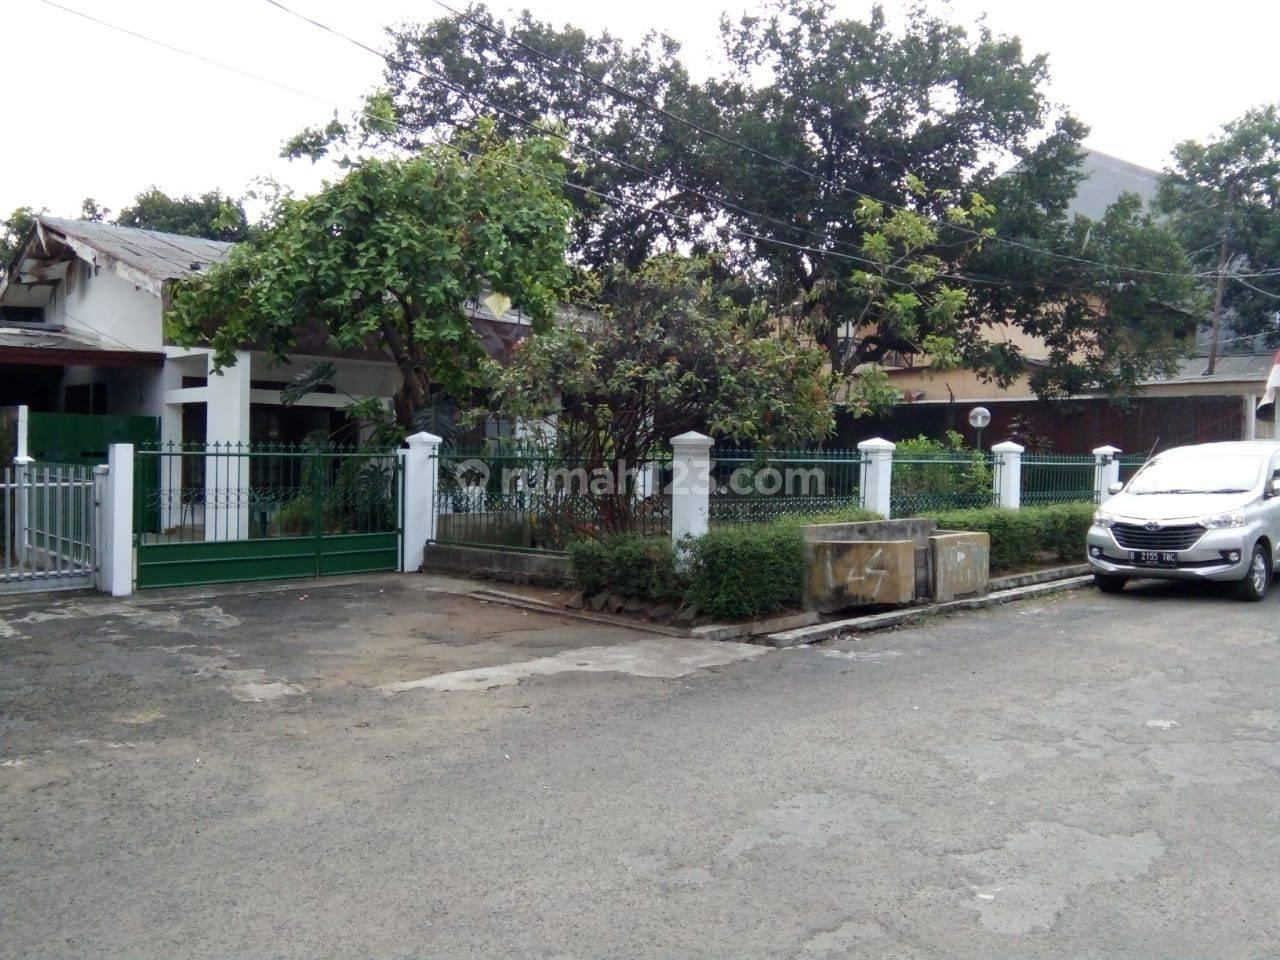 Rumah Tua Hitung Tanah dalam Komplek DIBAWAH NJOP dI Jl. Warung jati, Pancoran, Jakarta Selatan